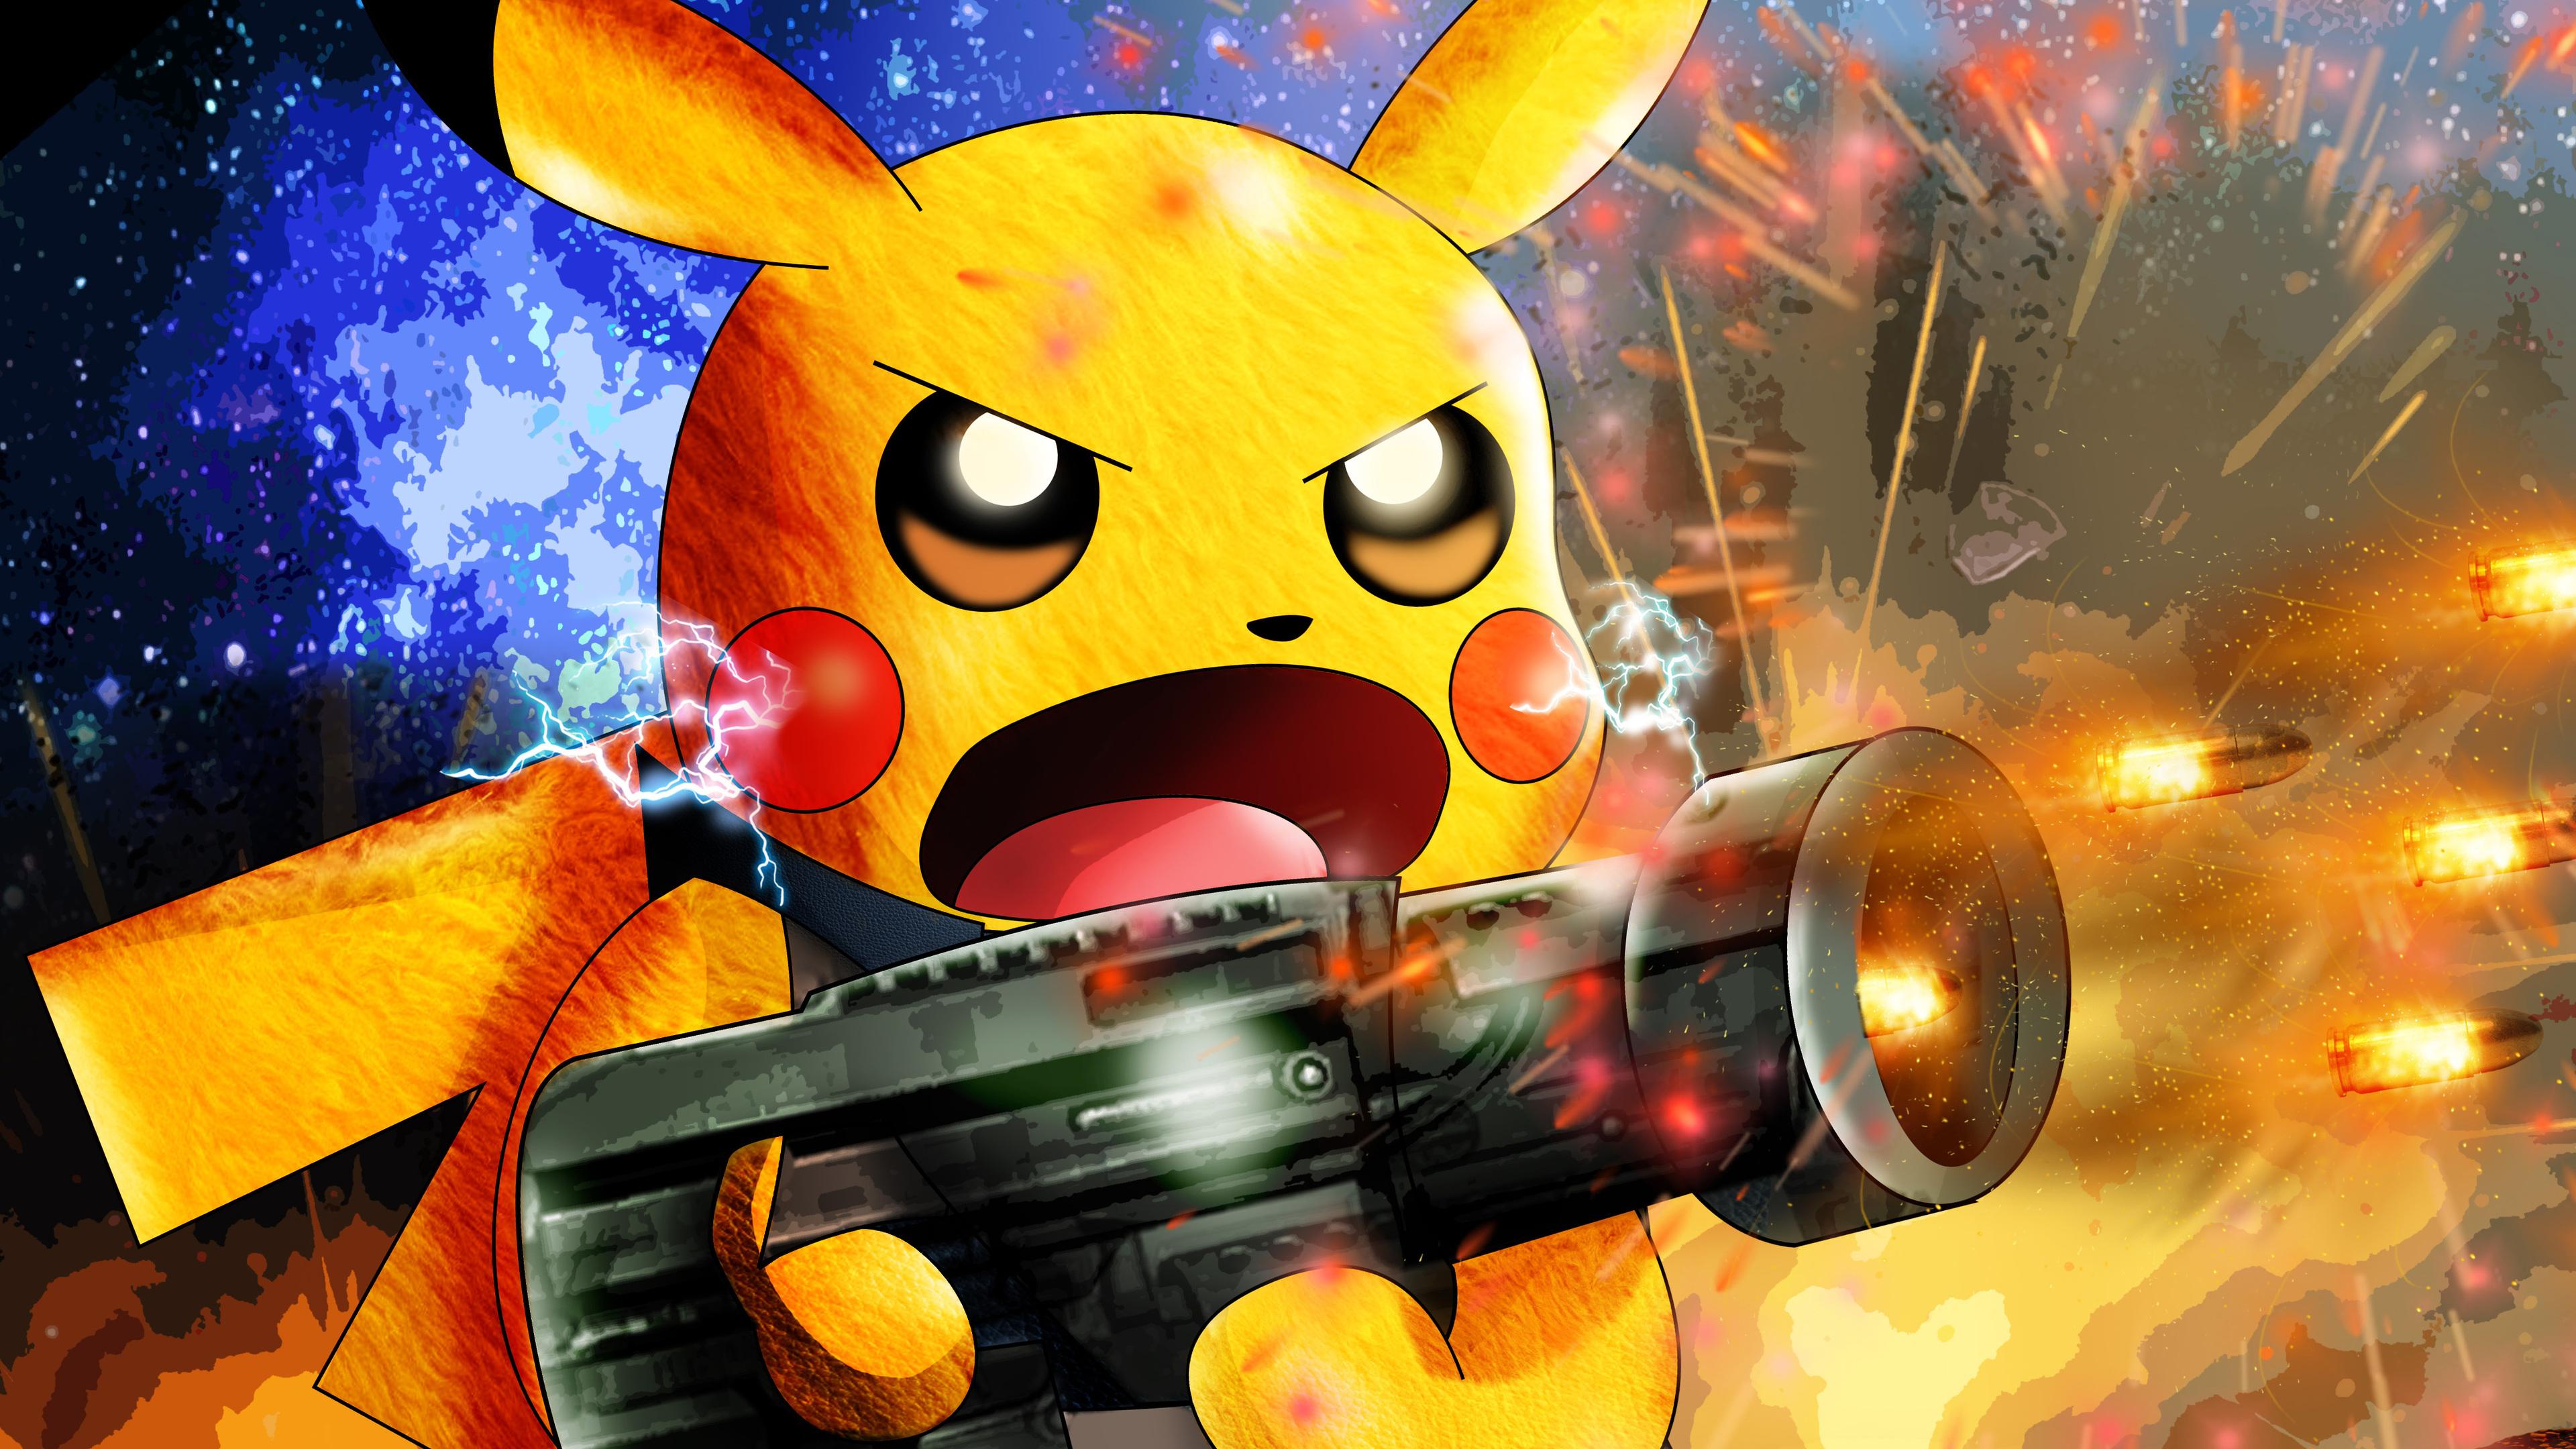 Pikachu As Rocket Raccoon 4k pokemon wallpapers, pikachu wallpapers, hd-wallpapers, digital art ...